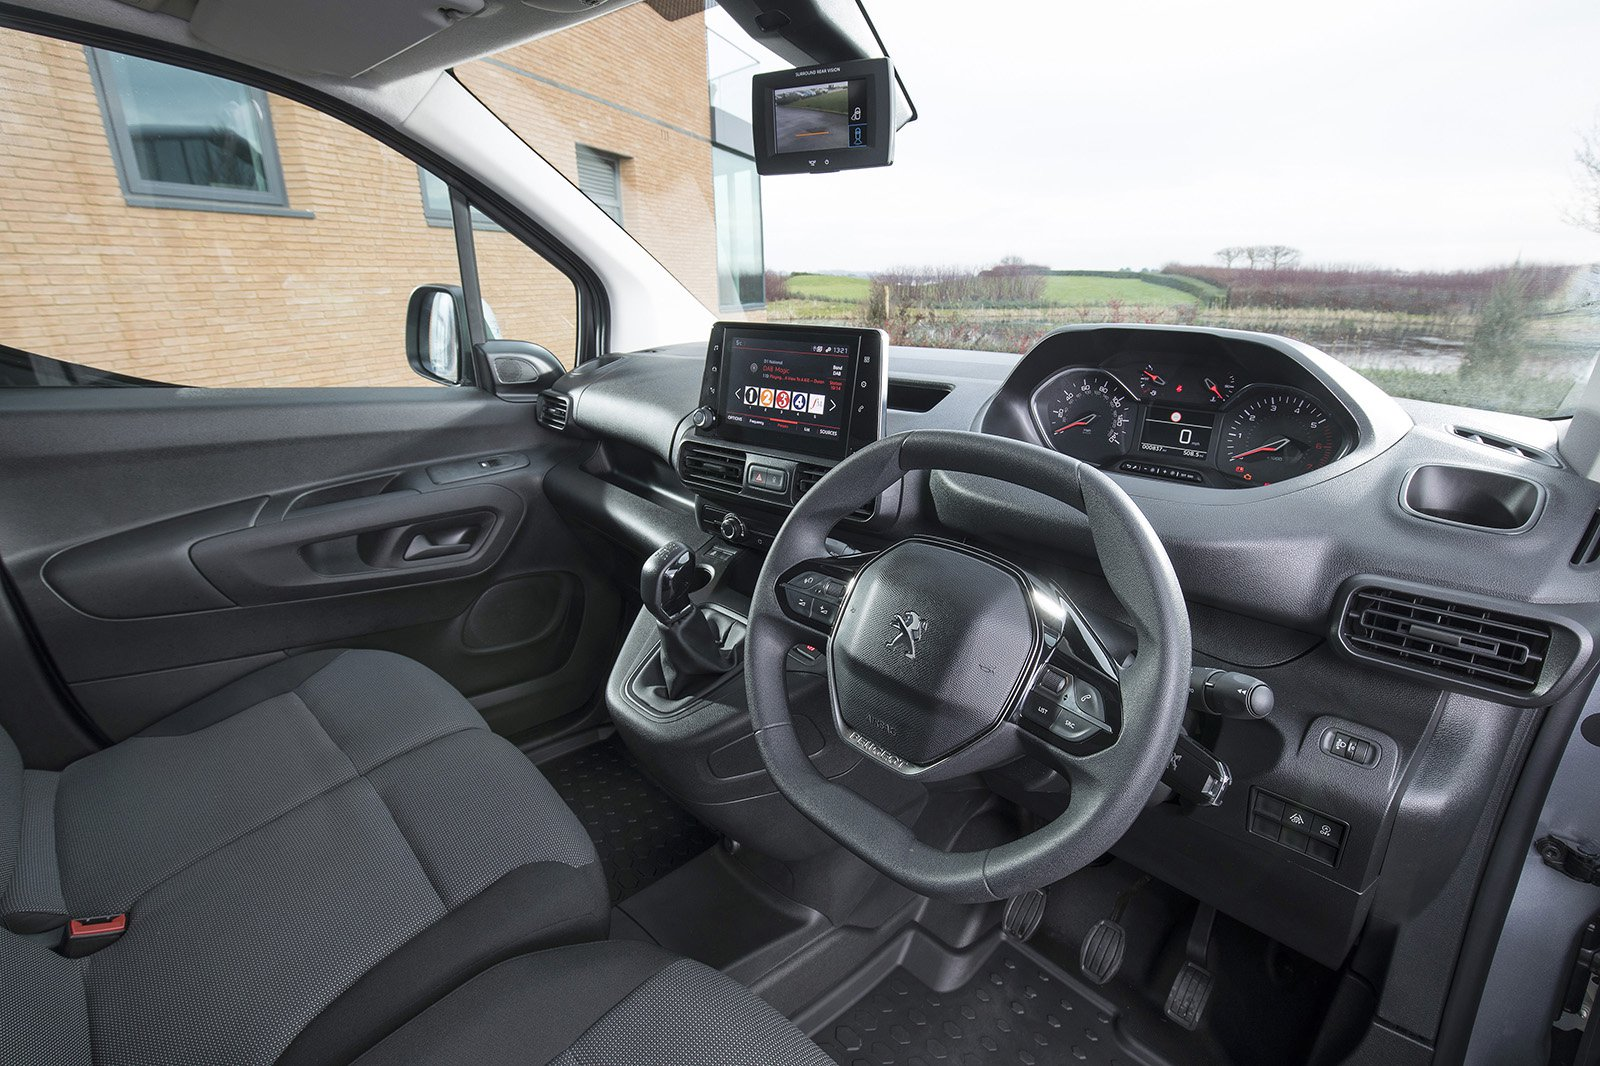 Peugeot Partner interior